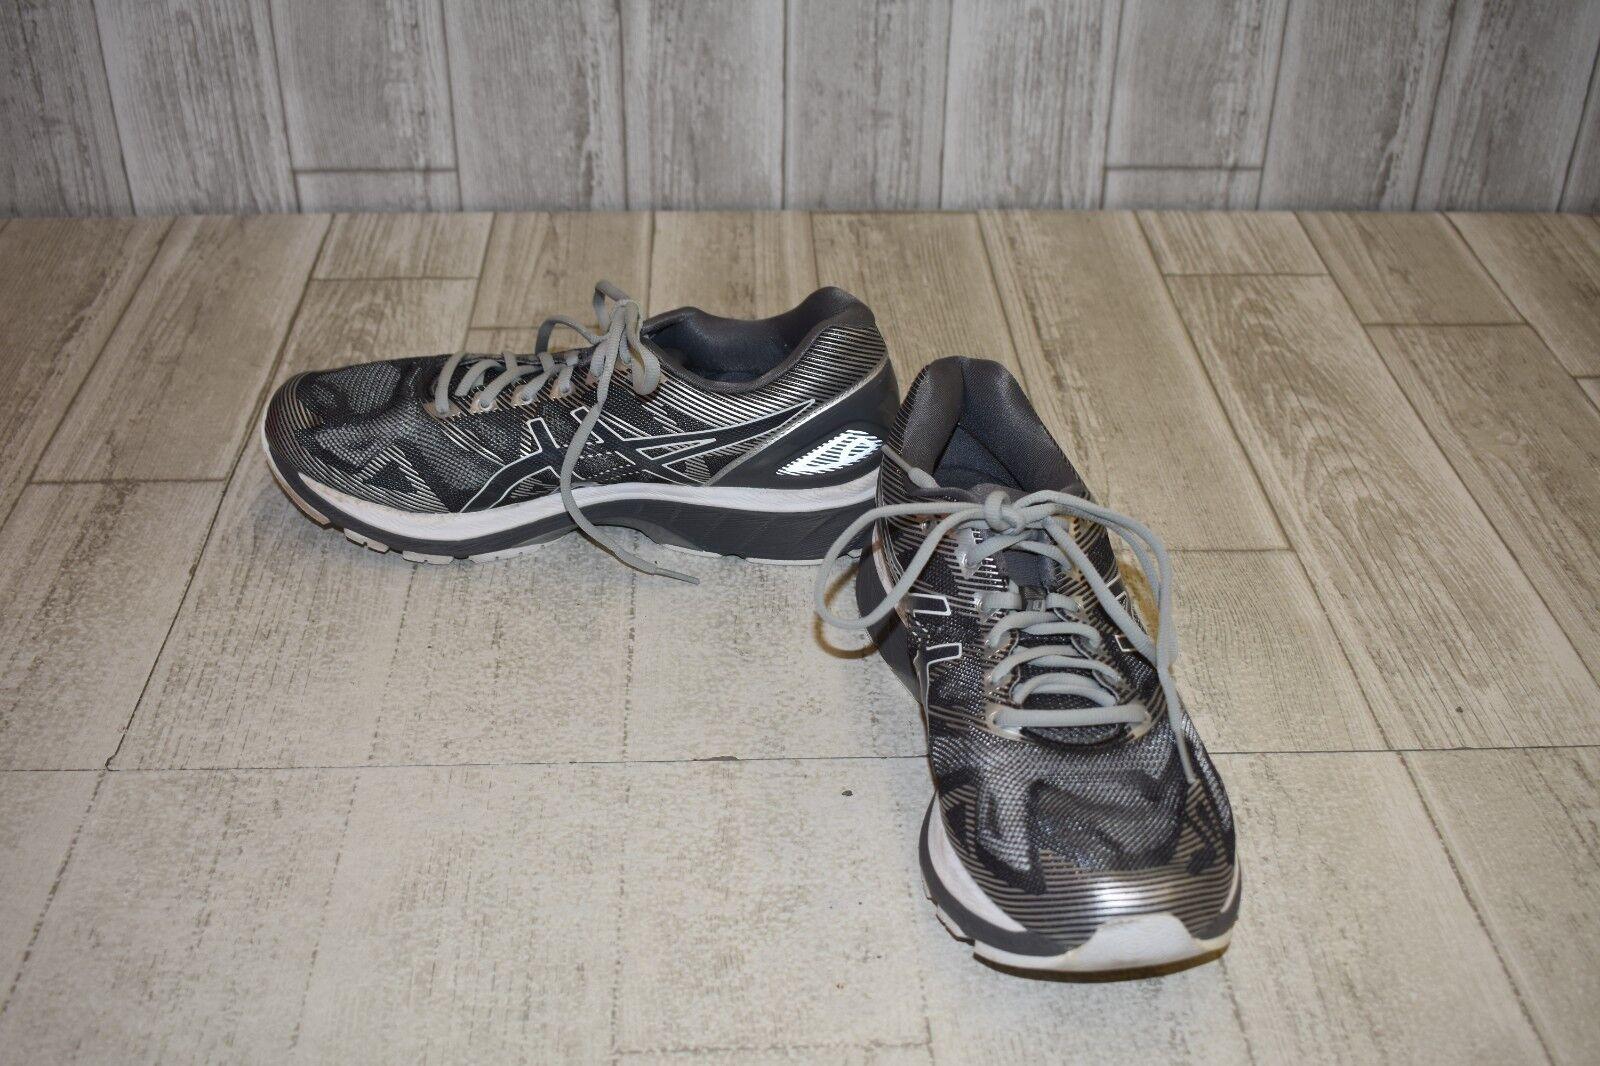 ASICS GEL-Nimbus 19 Running shoes, Men's Size 10-4E, Carbon Silver